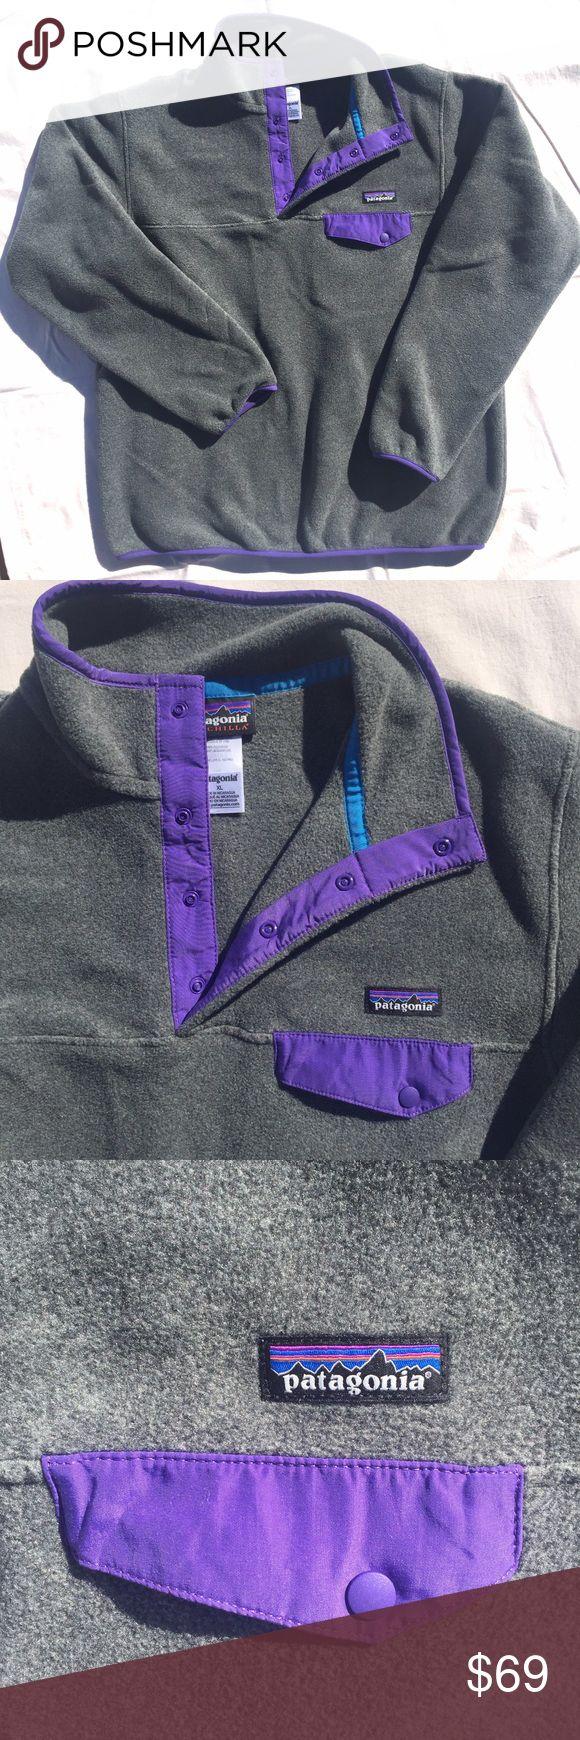 ✨NWOT✨ Patagonia Fleece NWOT | never worn | Women's Lightweight Synchilla Snap-T Fleece Pullover | gray fleece | purple details | electric blue inside ribbing Patagonia Tops Sweatshirts & Hoodies